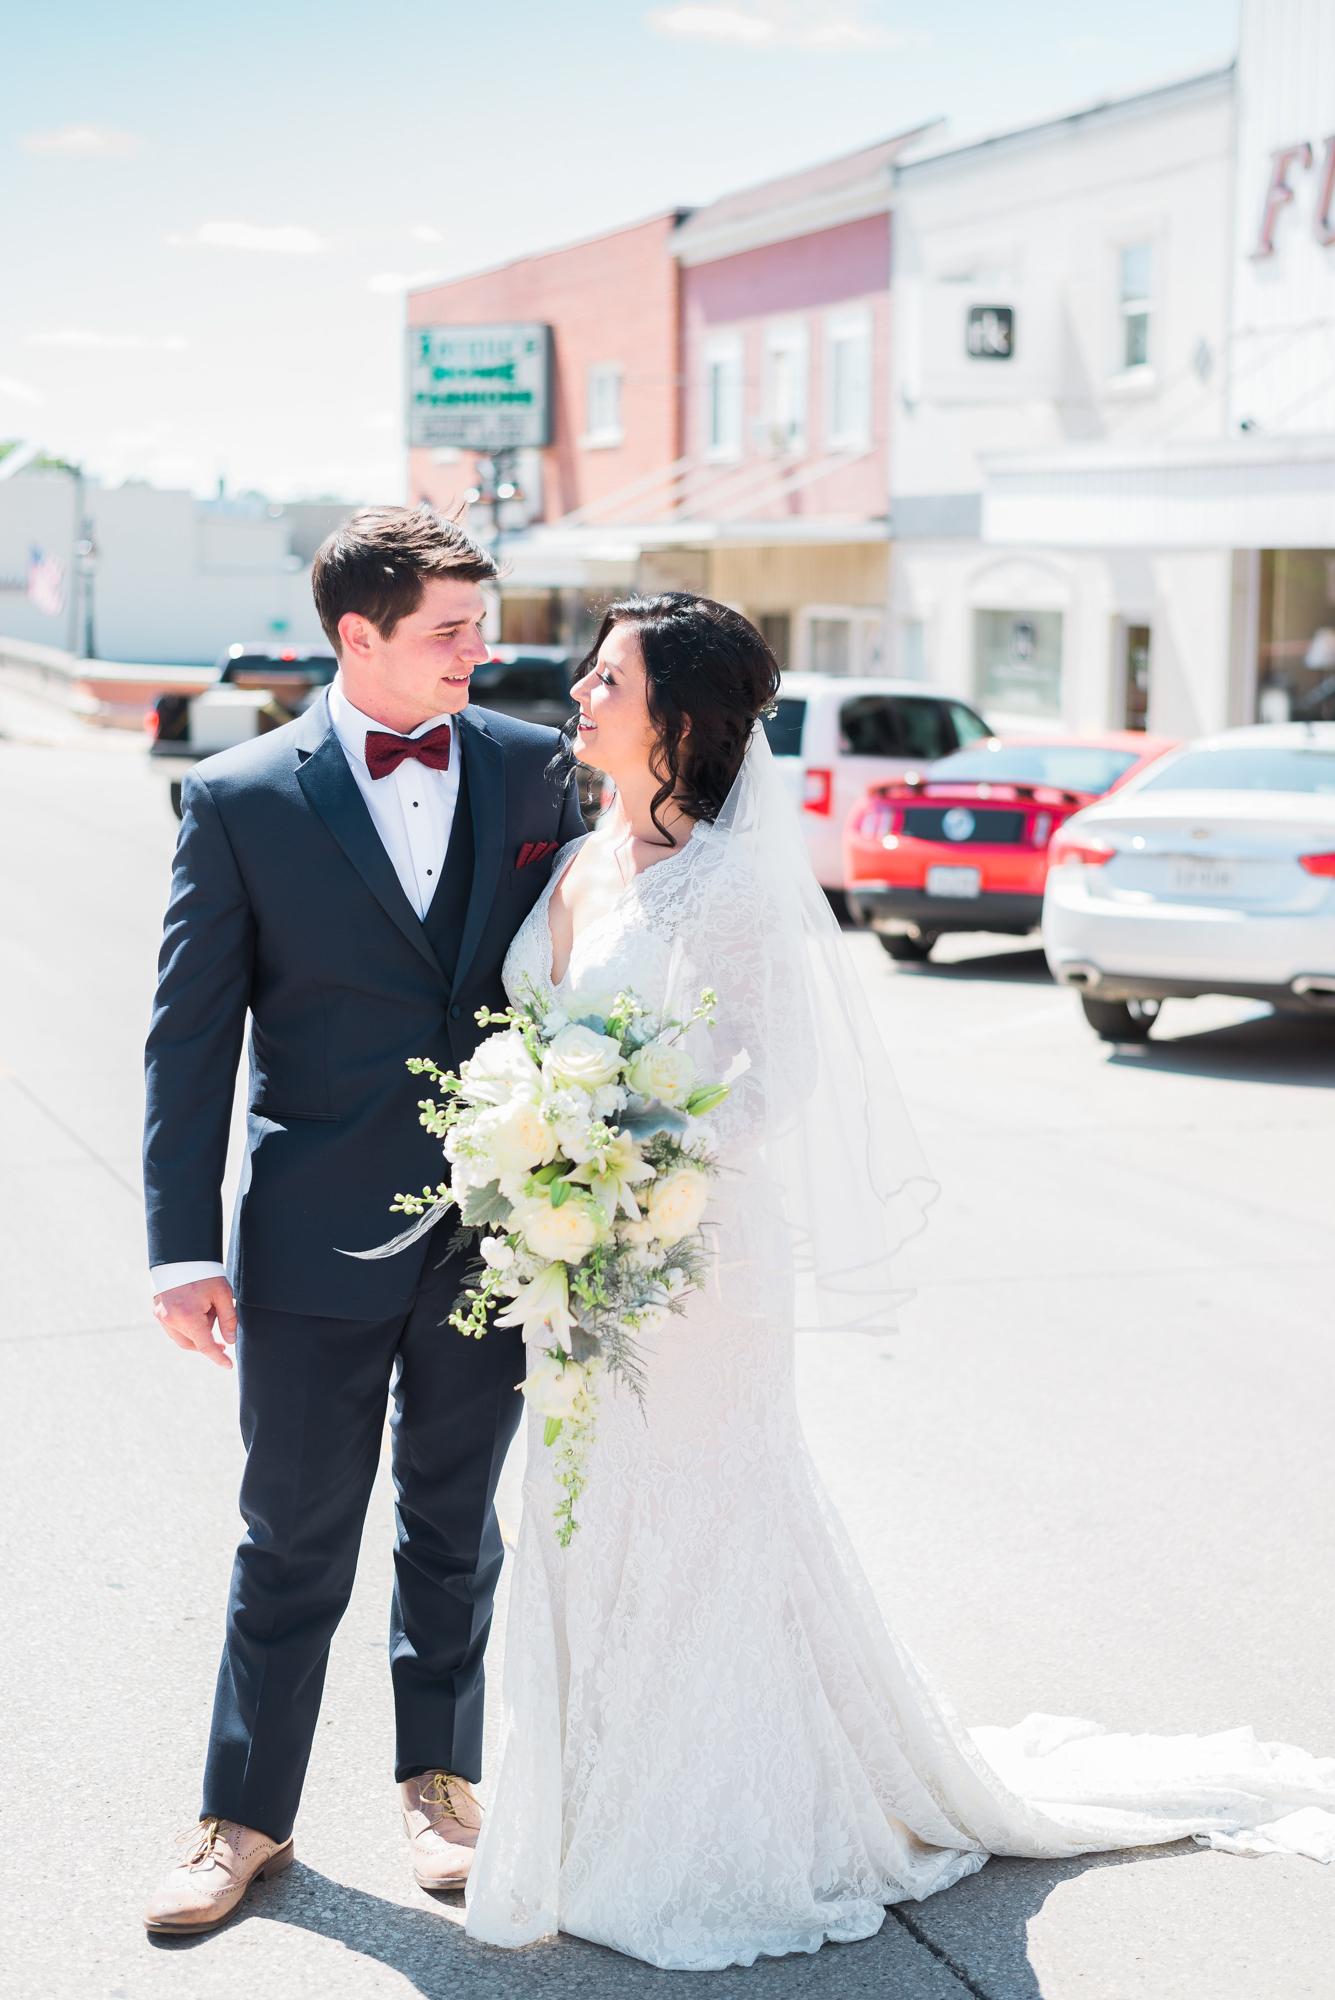 Field of Dreams - Dyersville, Iowa, Wedding Photographer